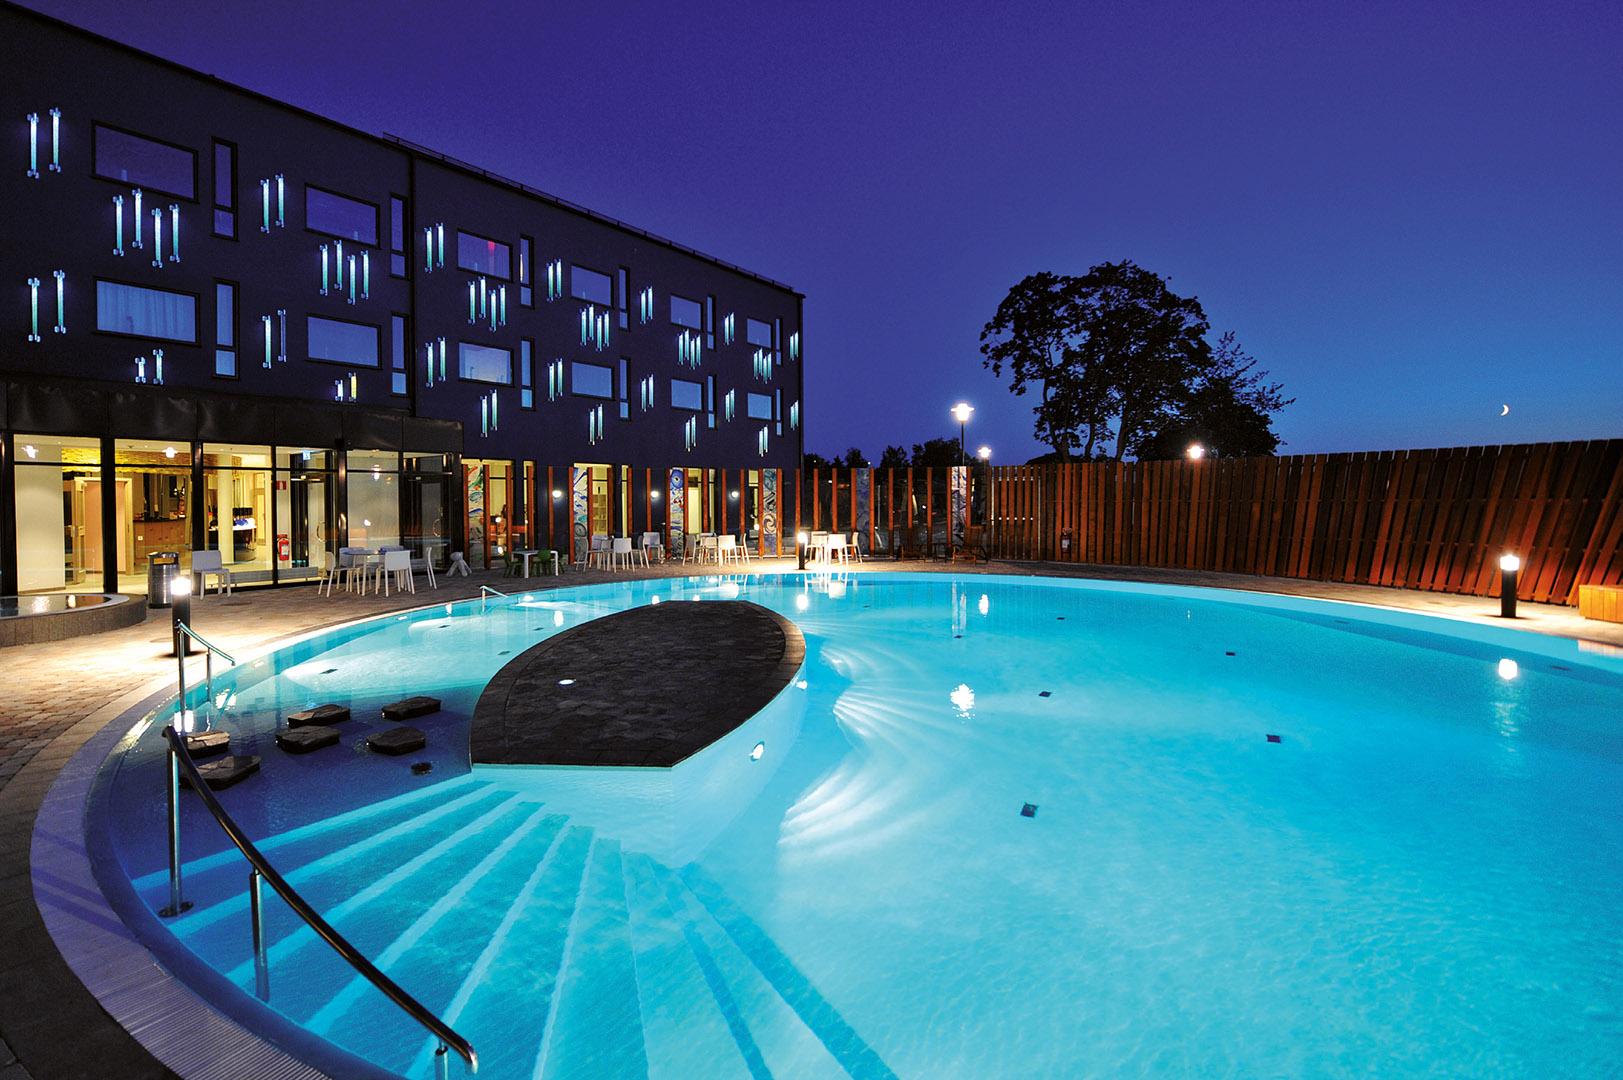 The outdoor pool at Kosta Boda Art Hotel